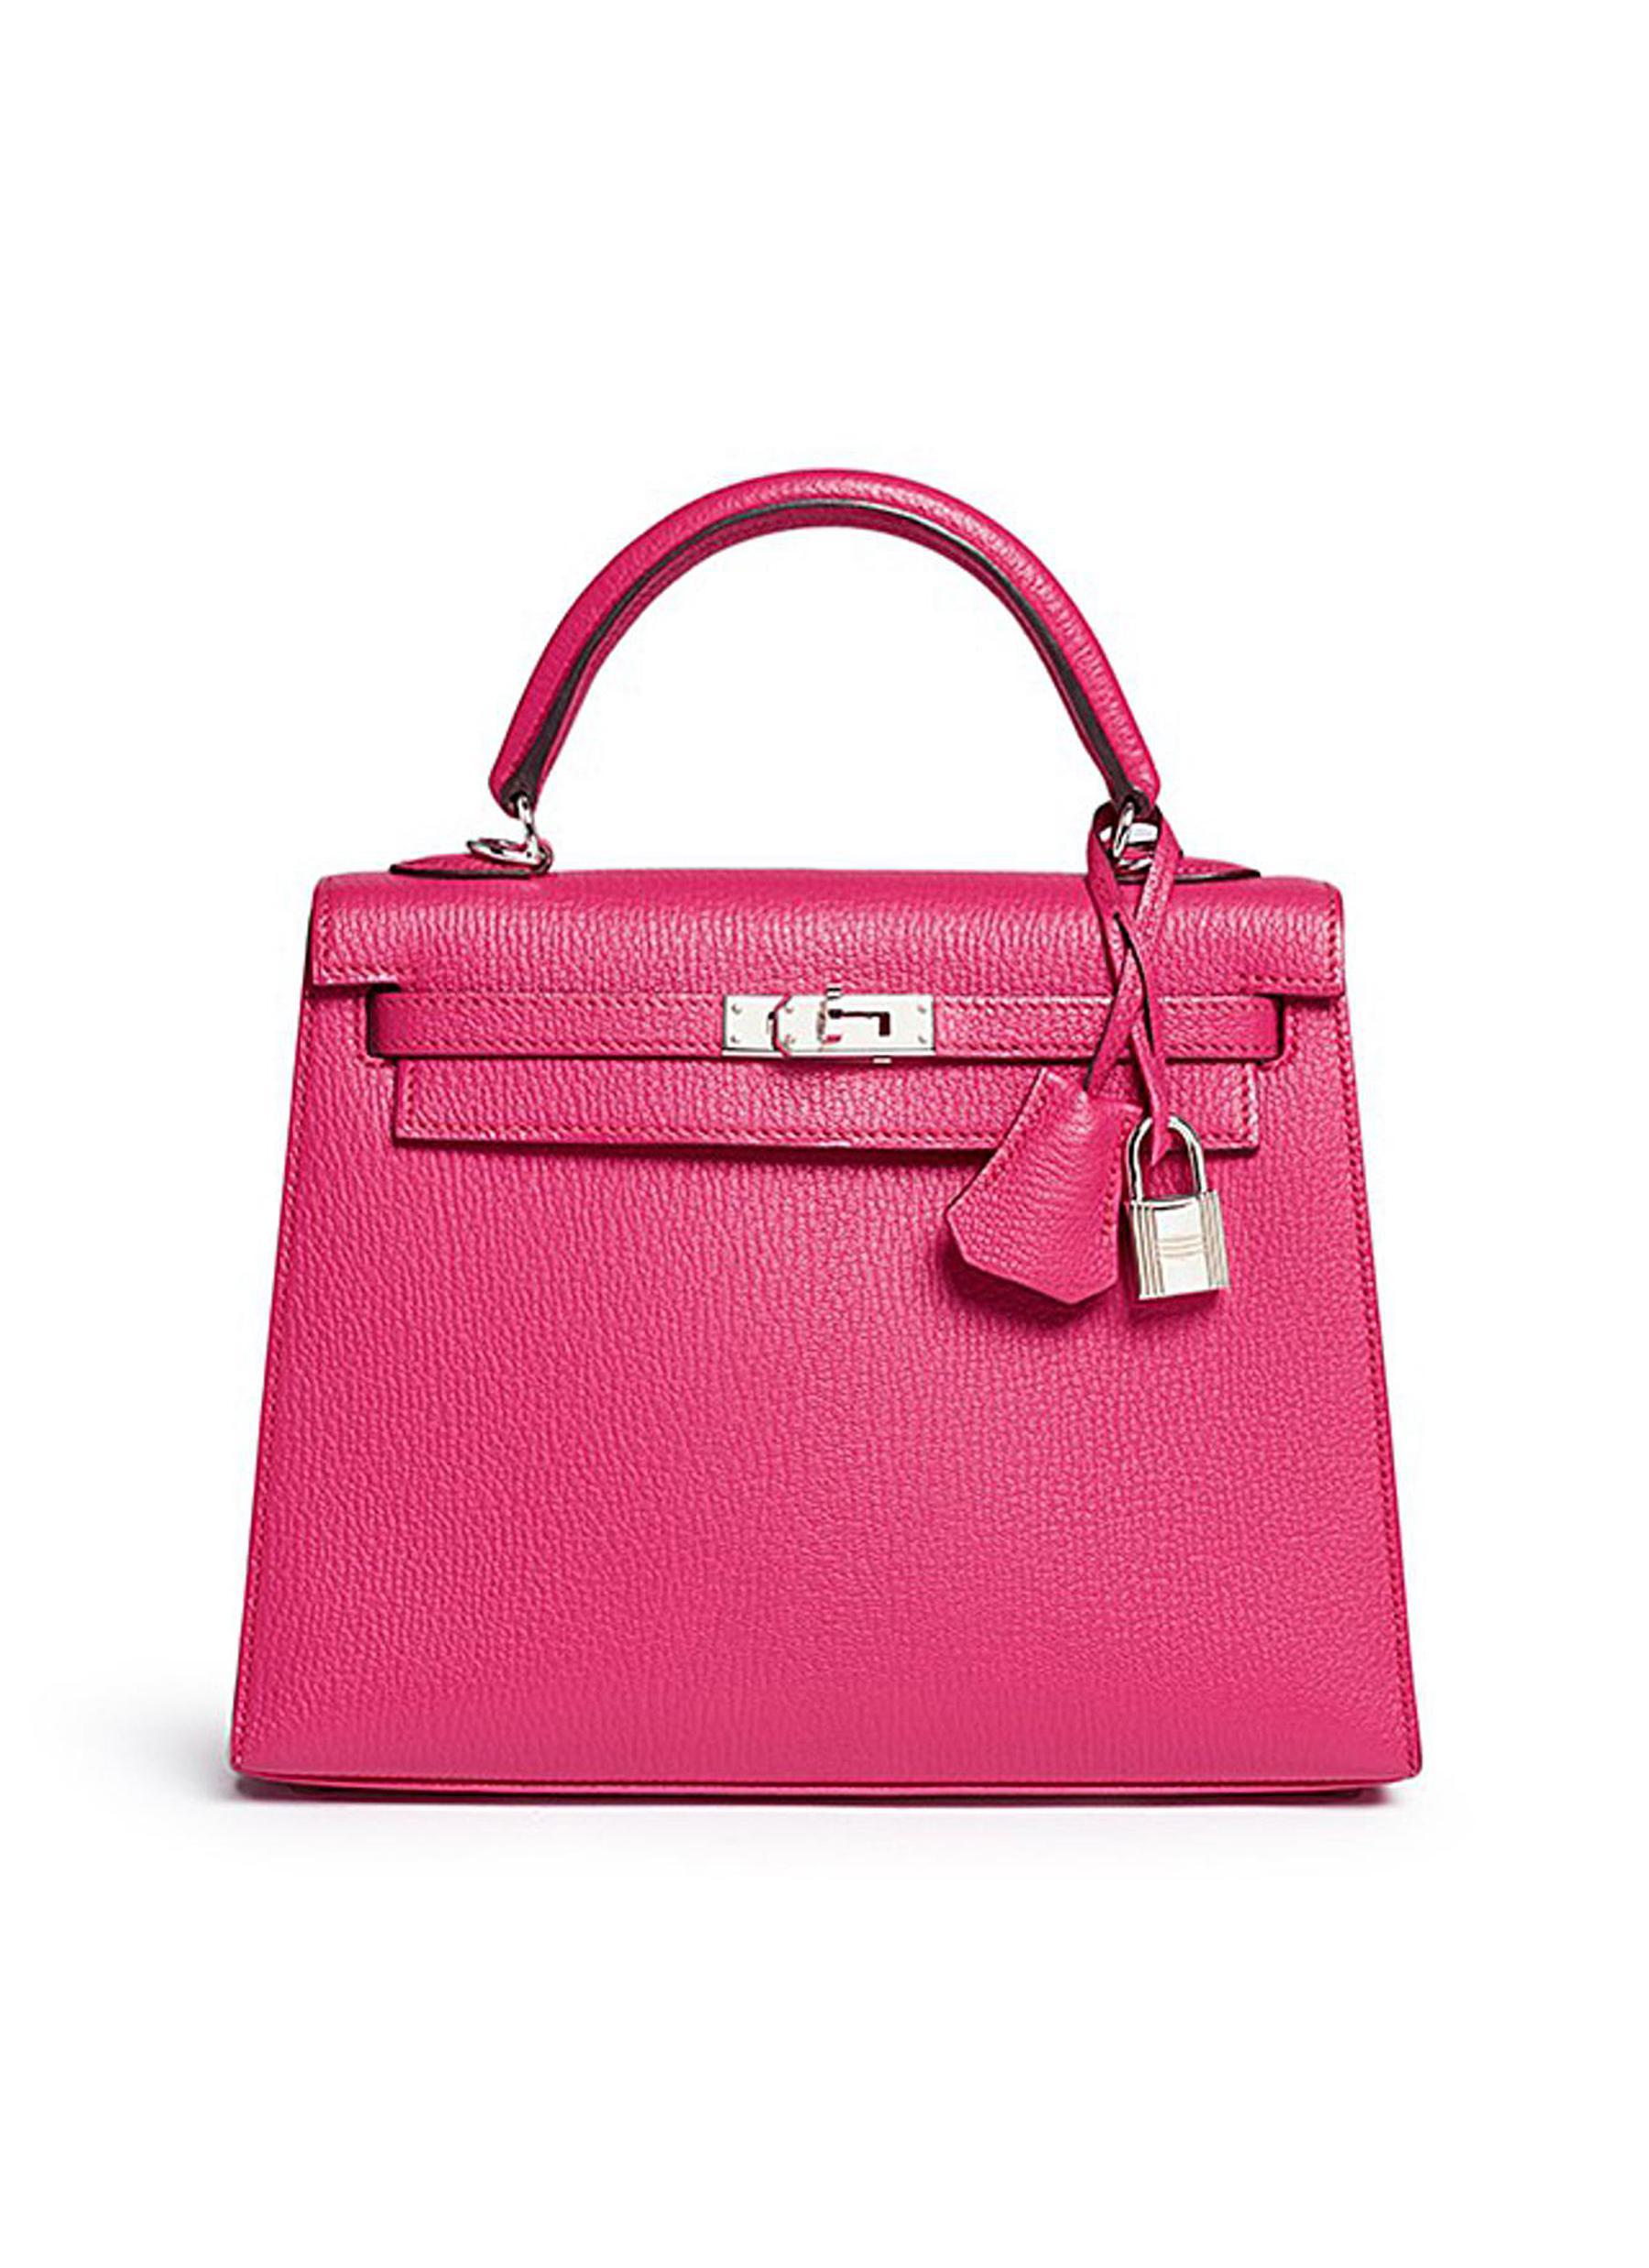 Kelly 25cm Chevre leather bag - VINTAGE HERMÈS - Modalova